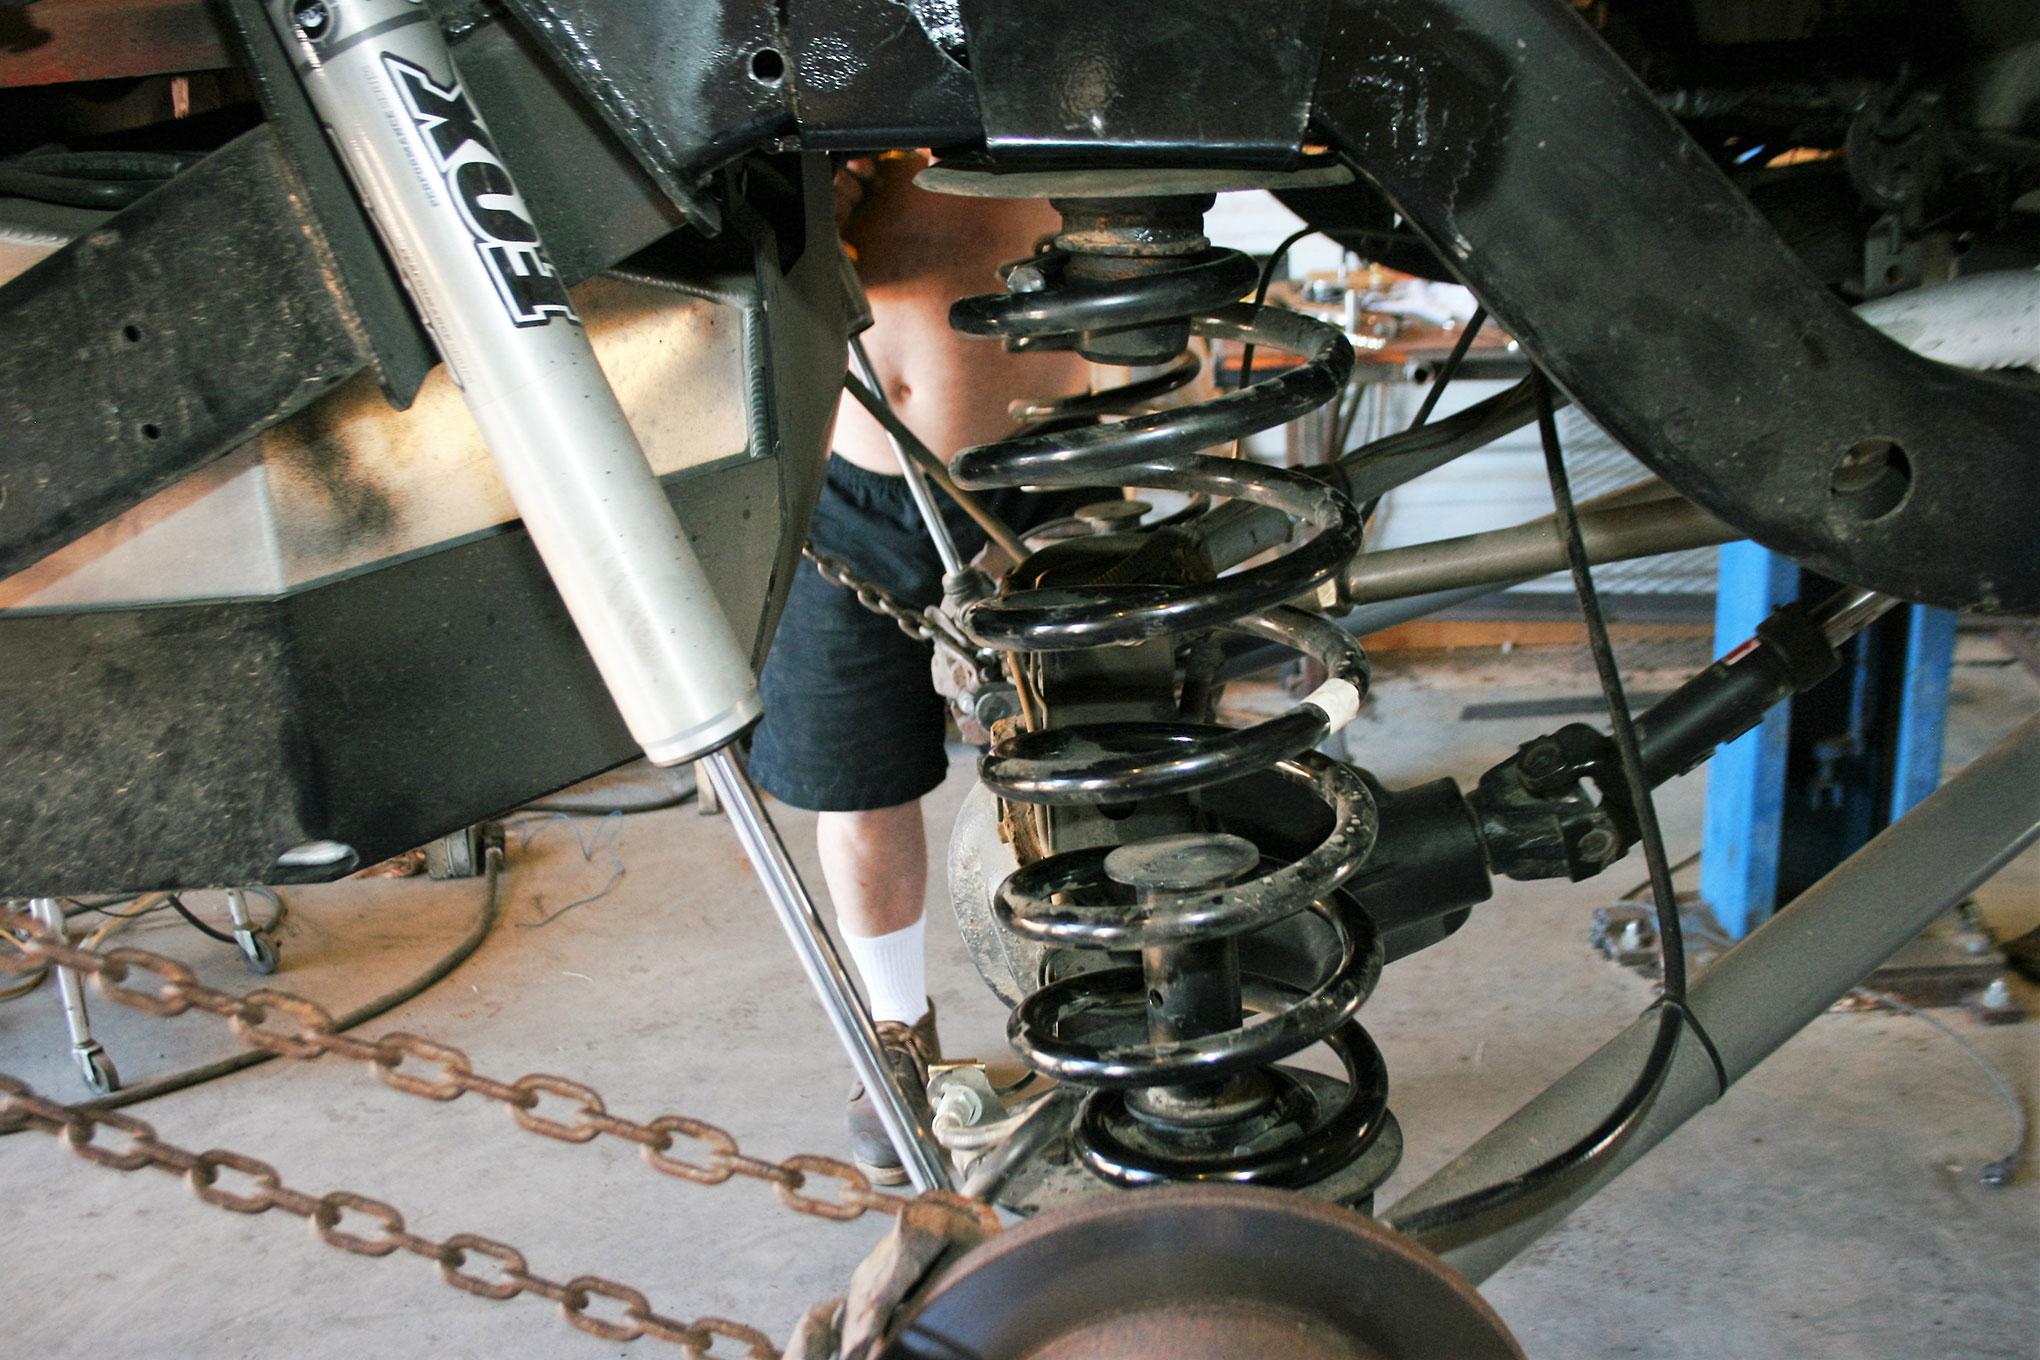 070 2005 rubicon suspension coil spring jeep bump stop arb